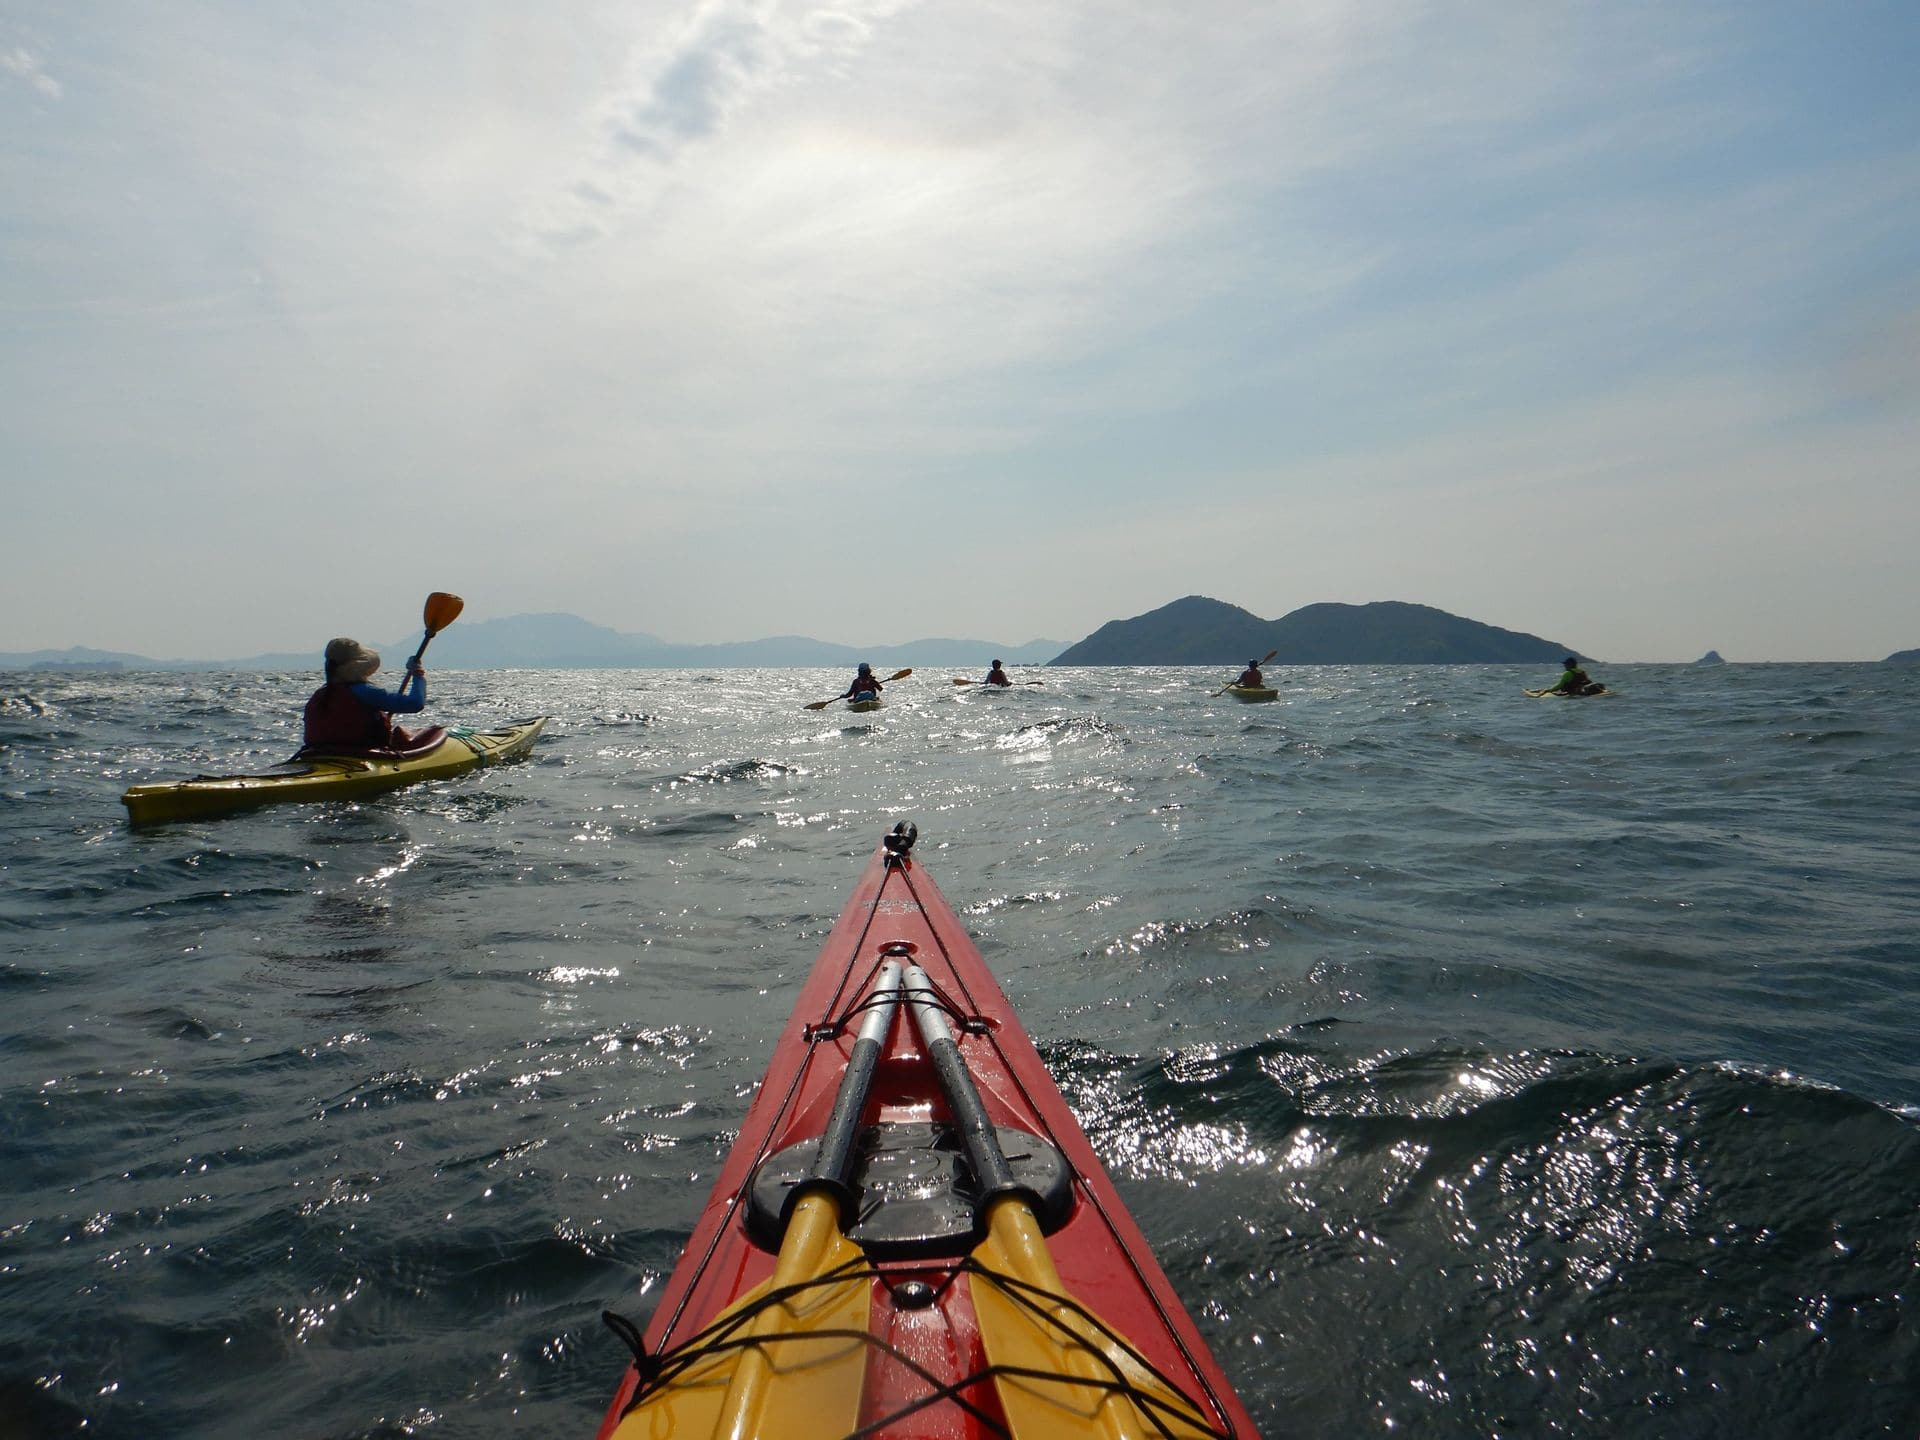 sea kayak journey in Hong Kong